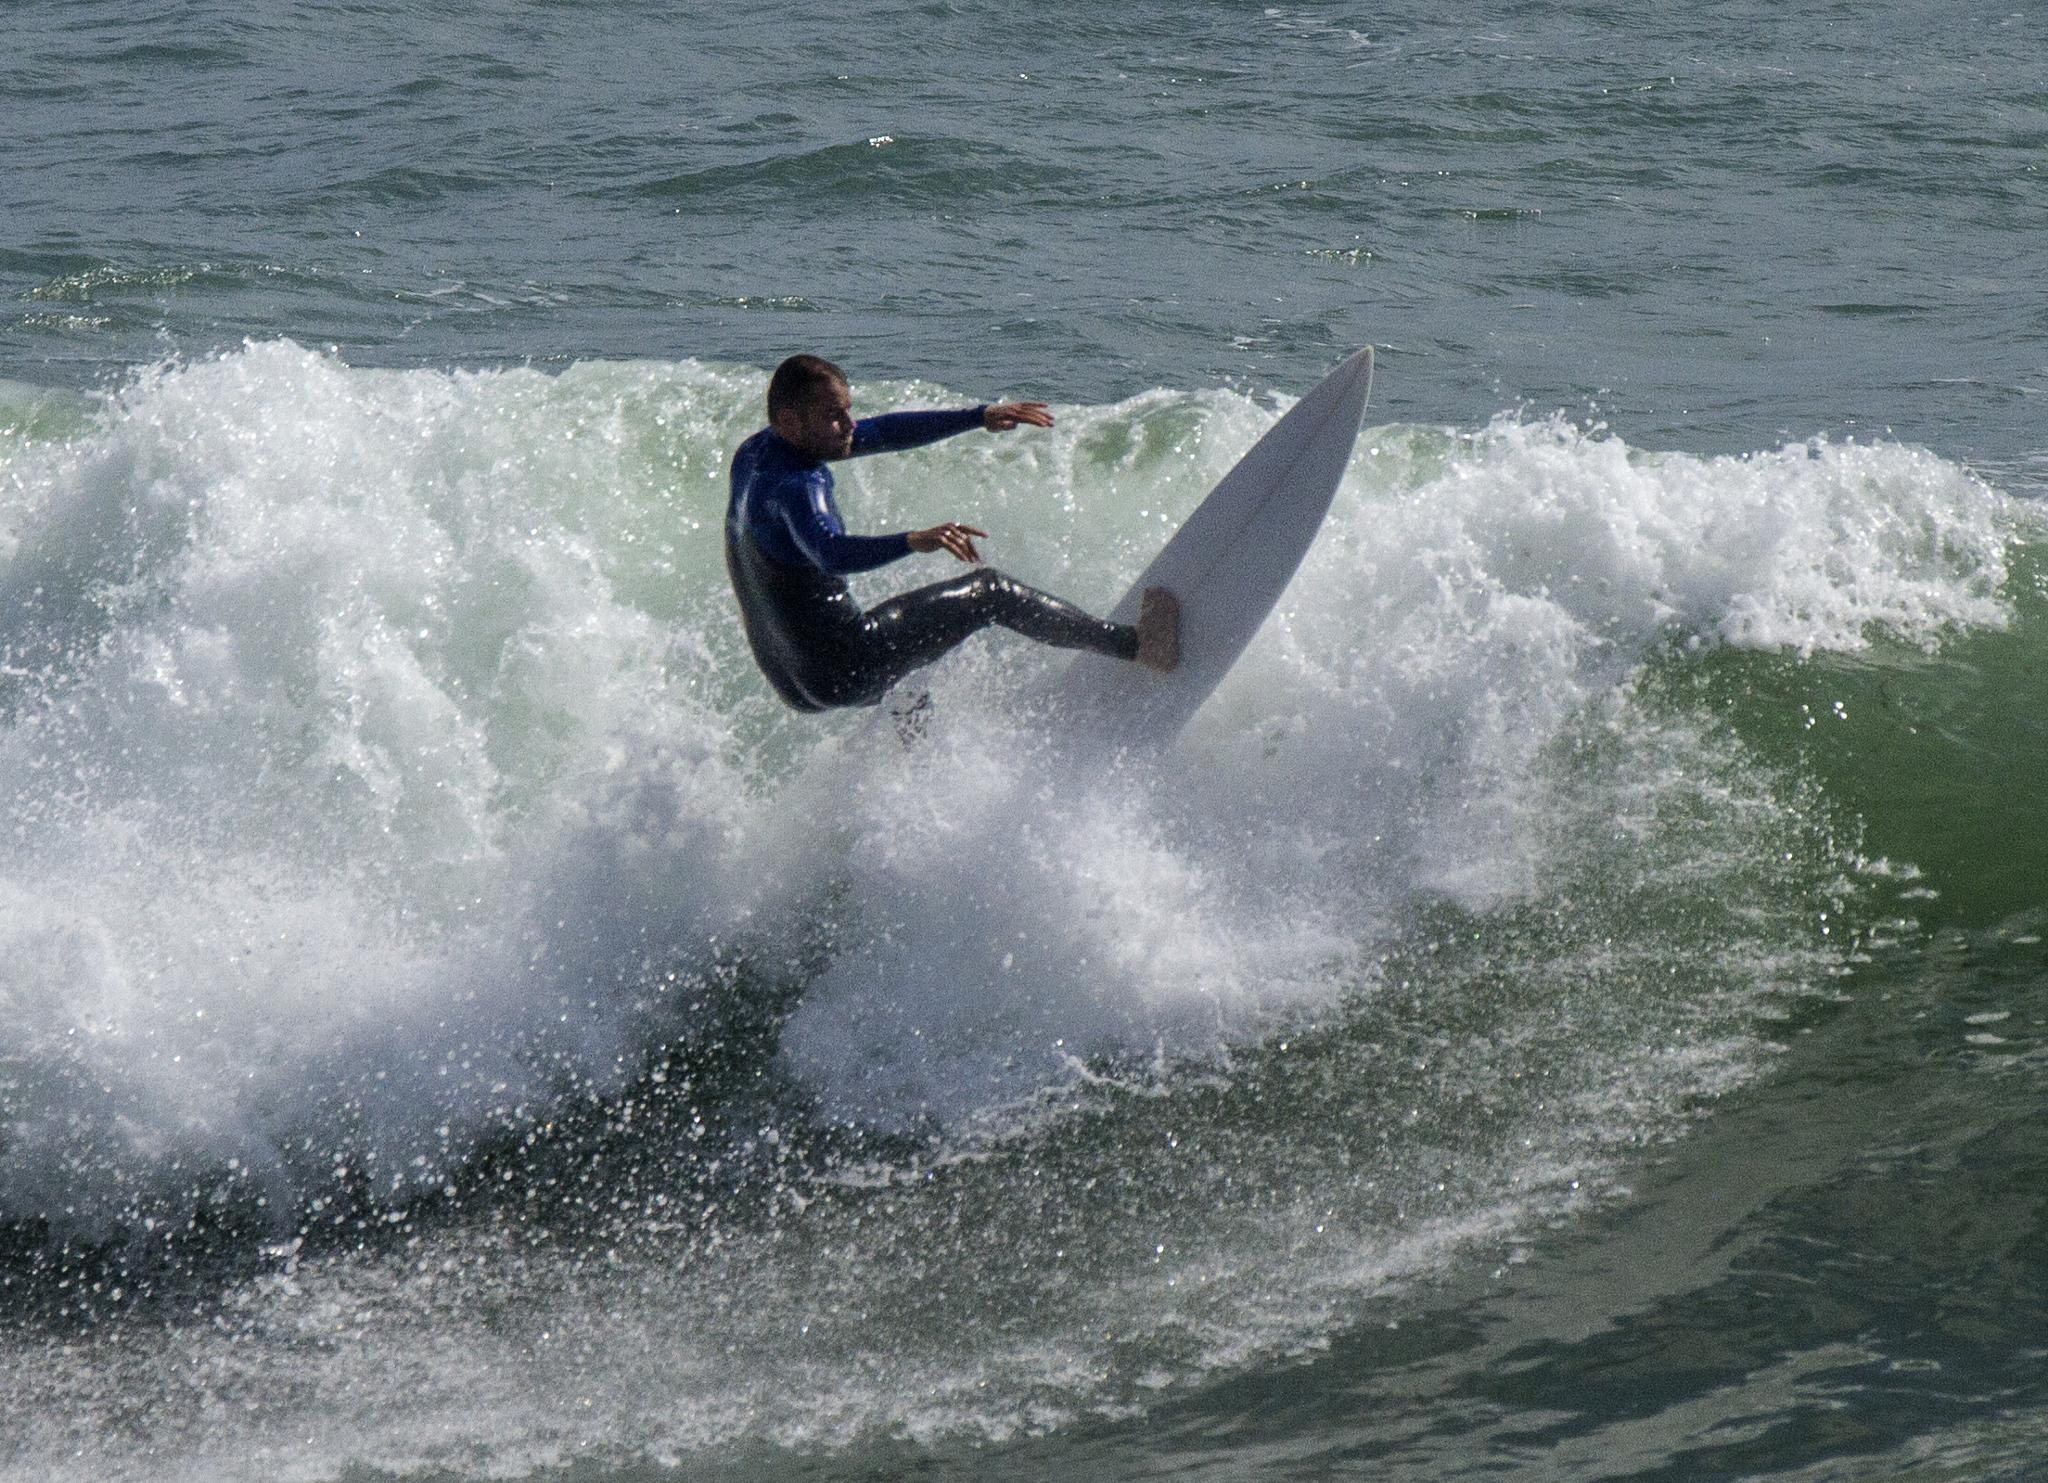 surfer  by johnrichards1466